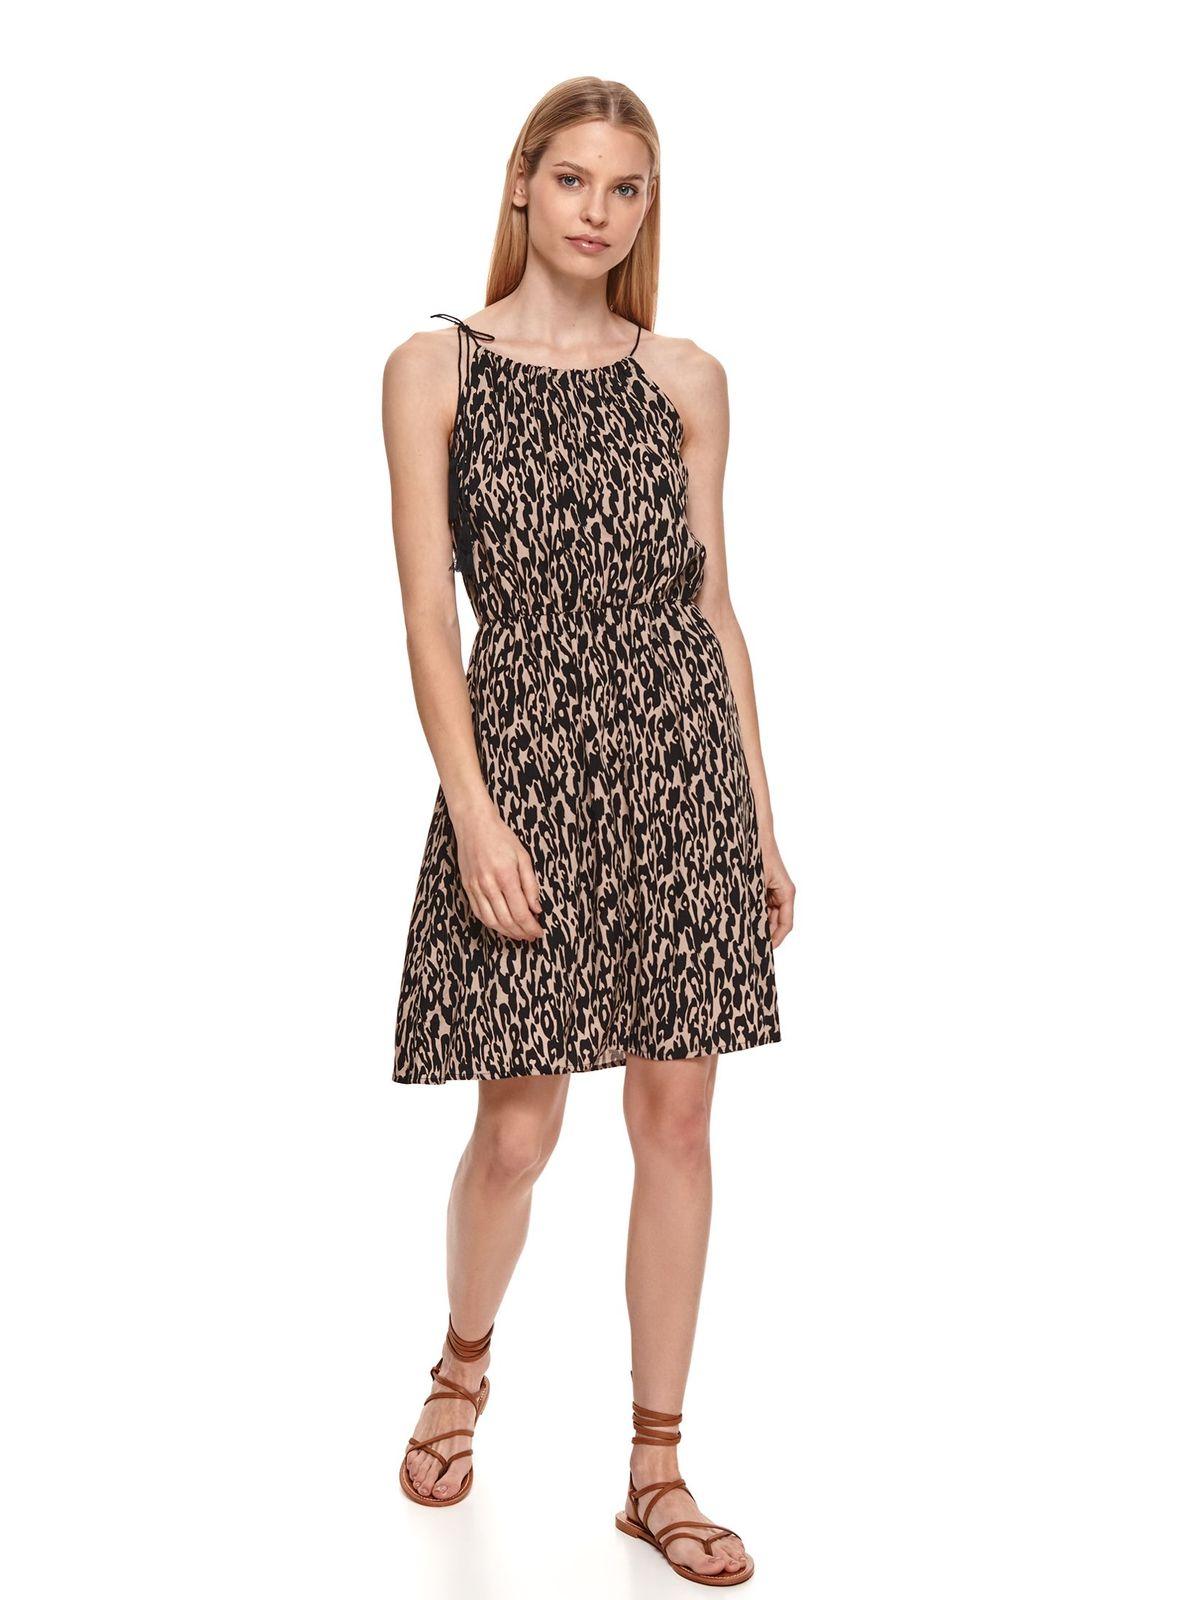 Black dress animal print cloche with elastic waist halter neck airy fabric